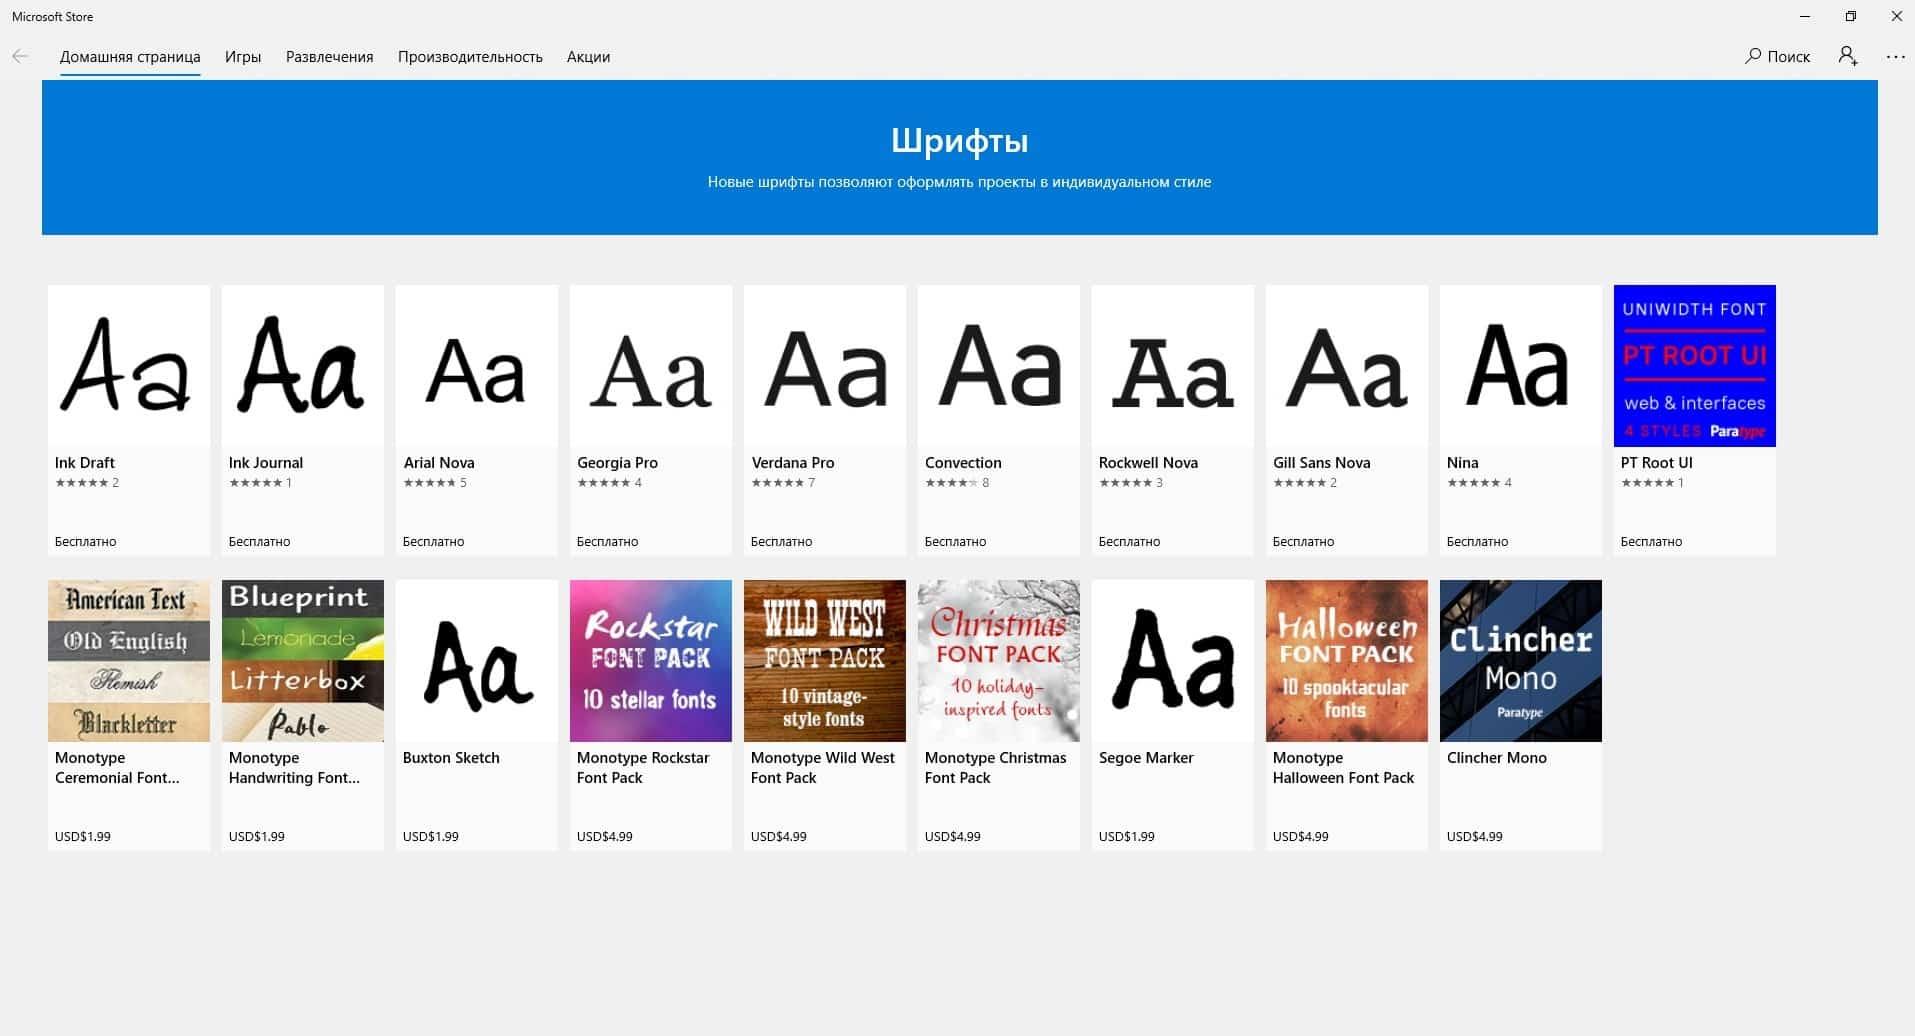 шрифты windows